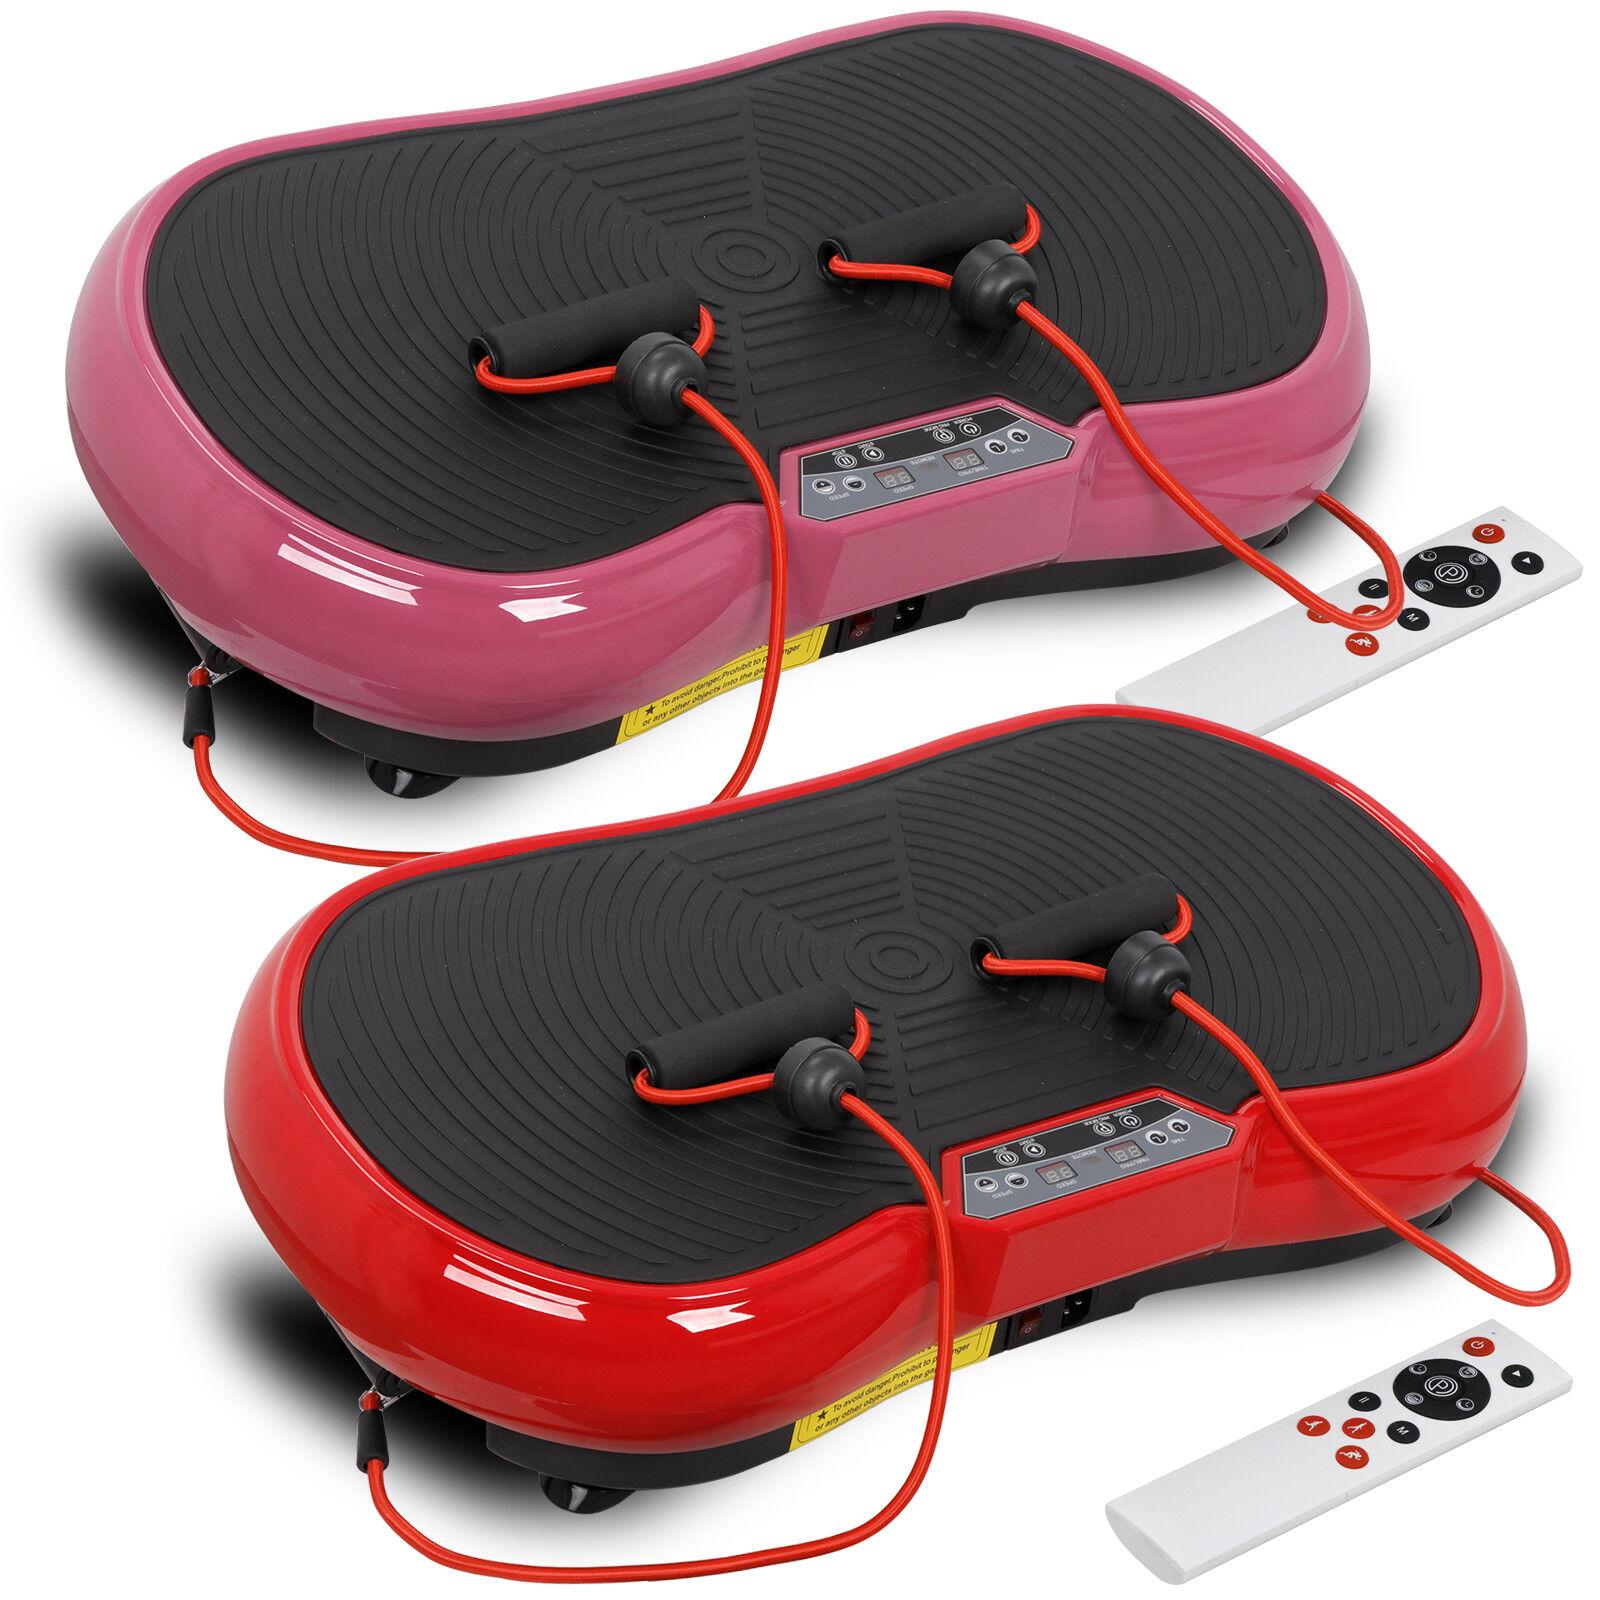 Ultrathin Crazy Fit Massage Vibration Platform Machine Fitness Gym W/Bluetooth Health & Beauty